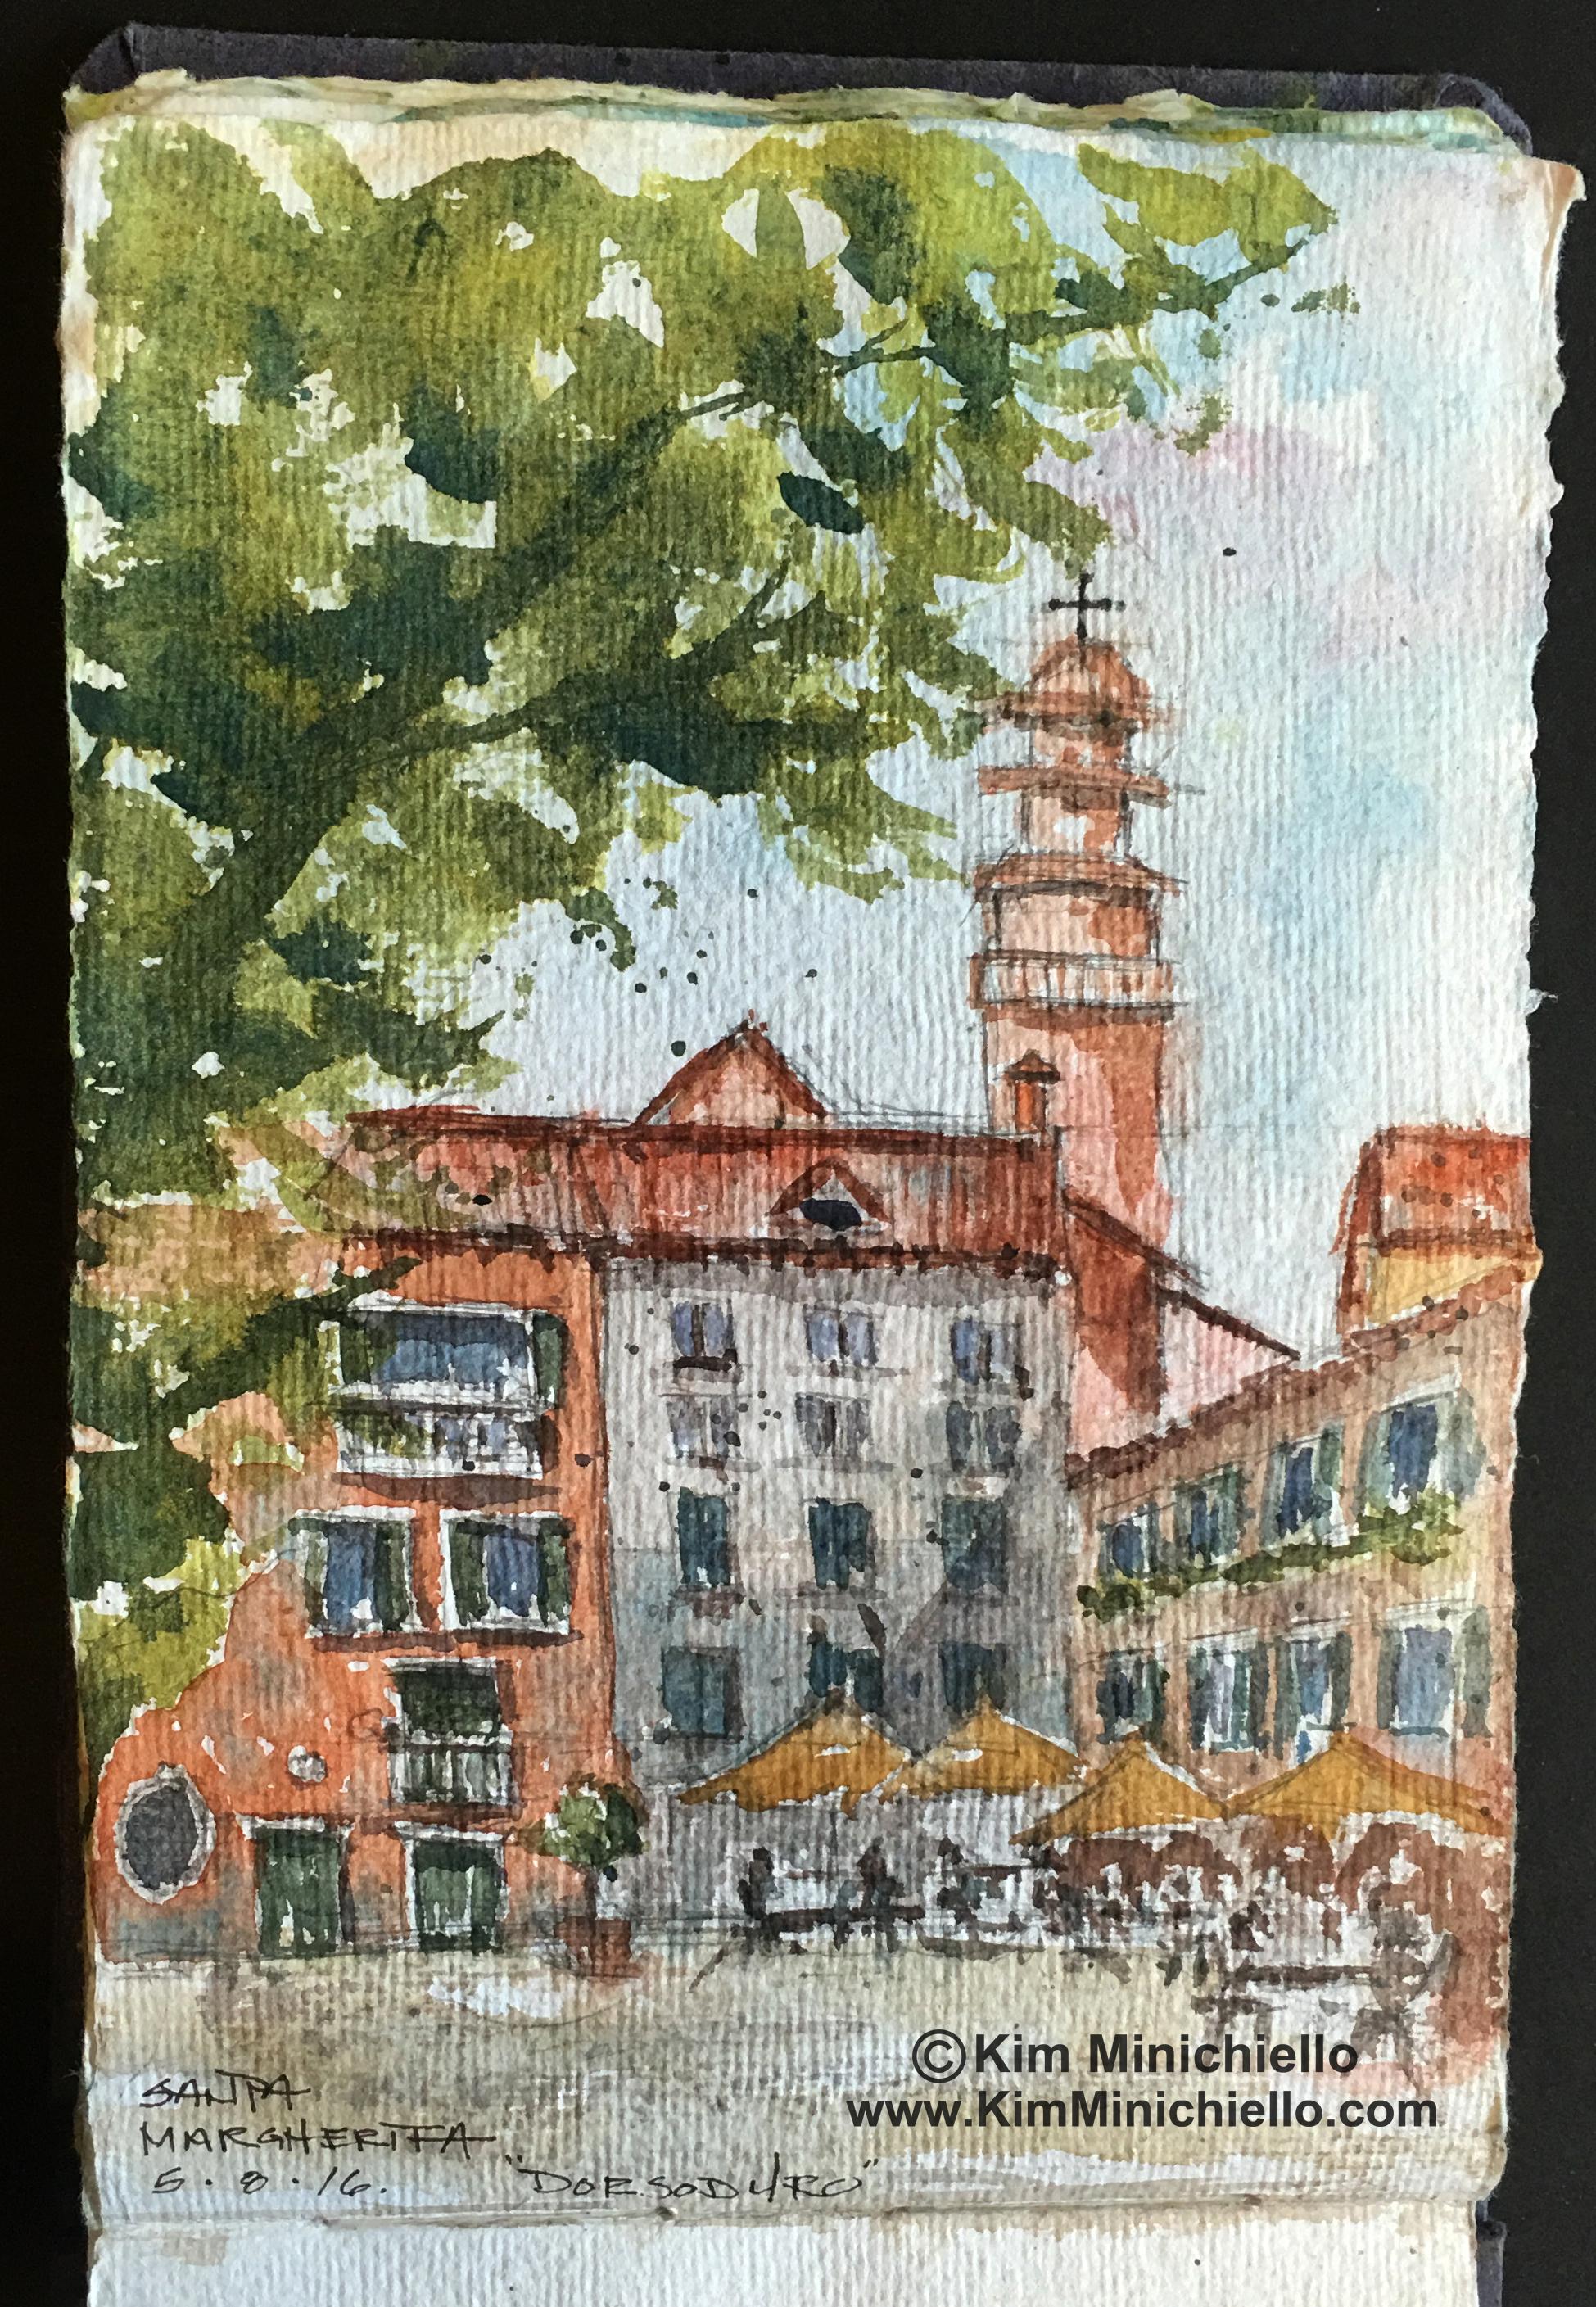 Venice-Square-copy-copy.jpg